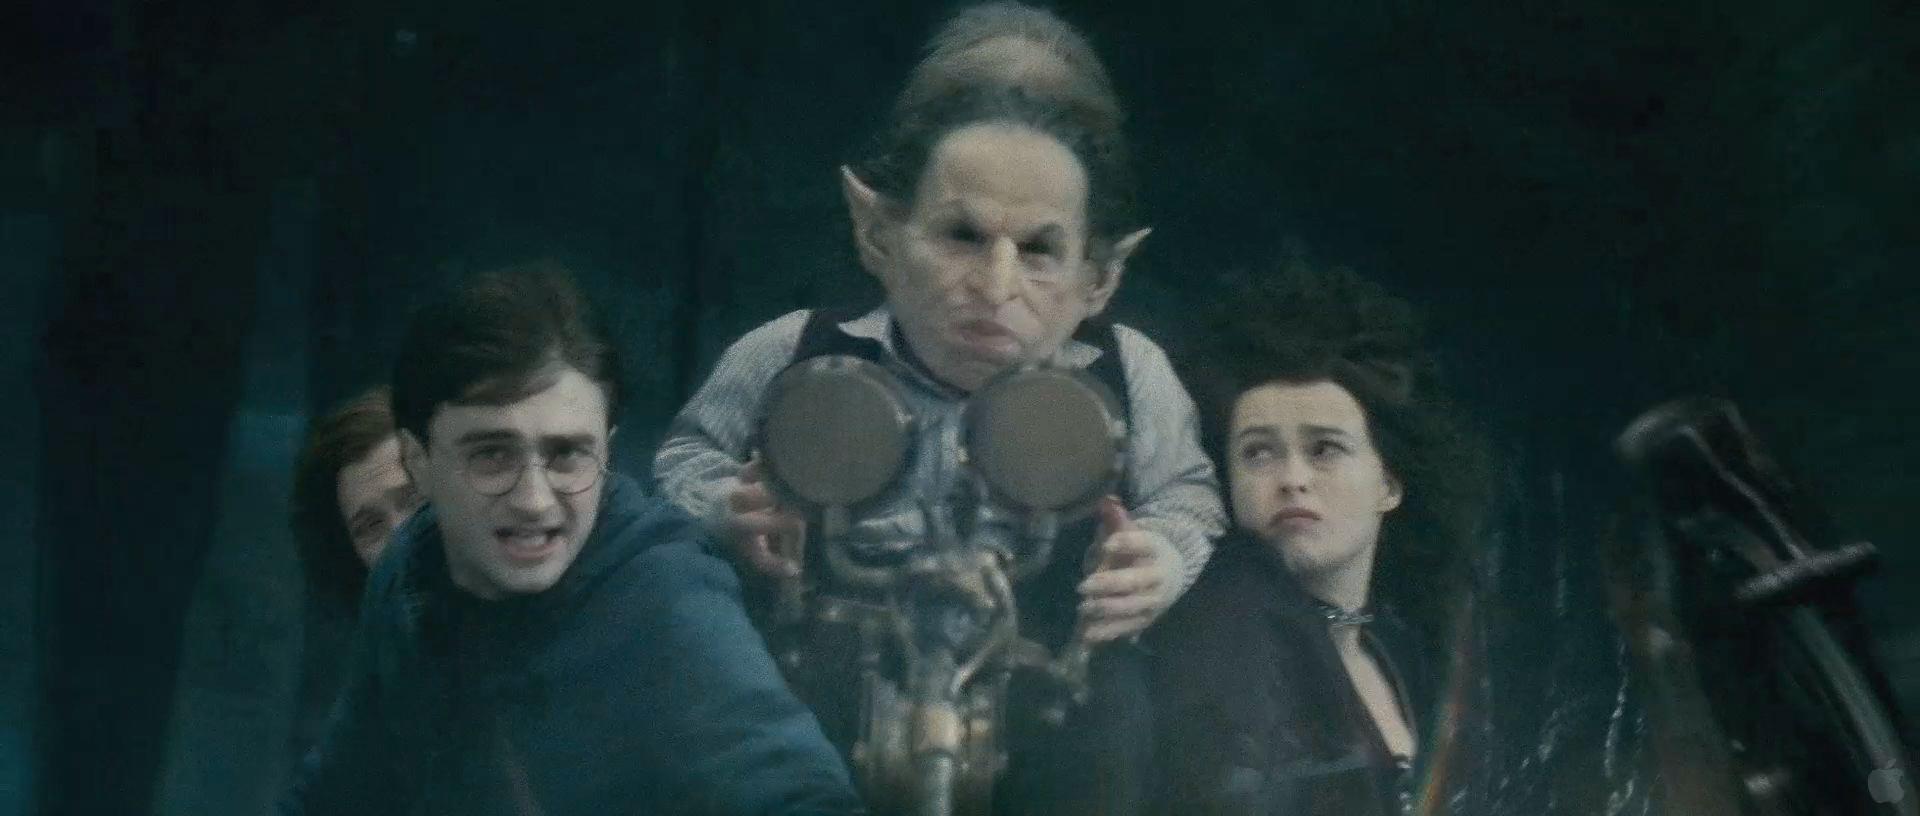 Harry Potter BlogHogwarts HP7 2 Trailer 23